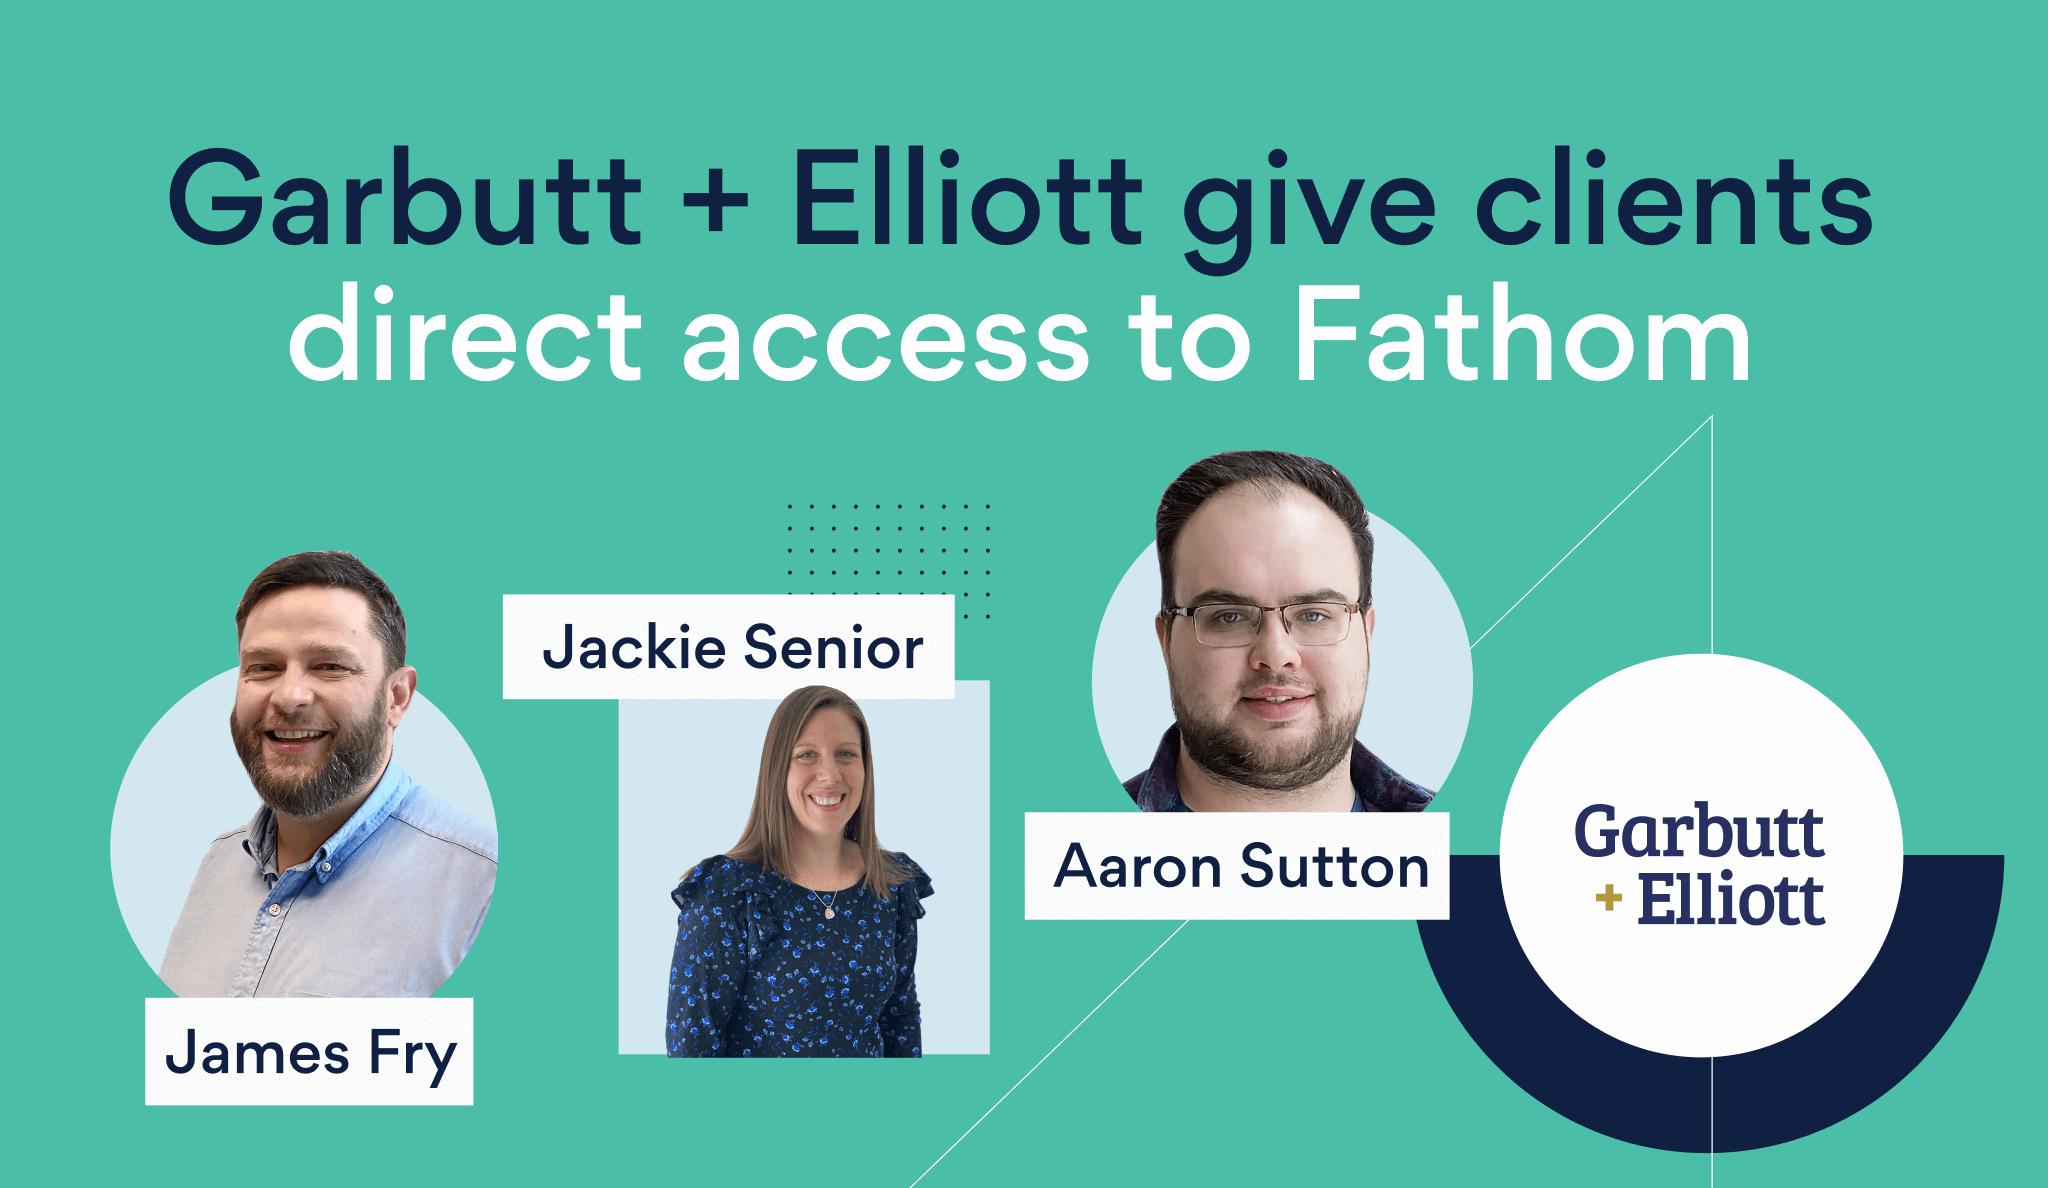 Garbutt+Elliot team